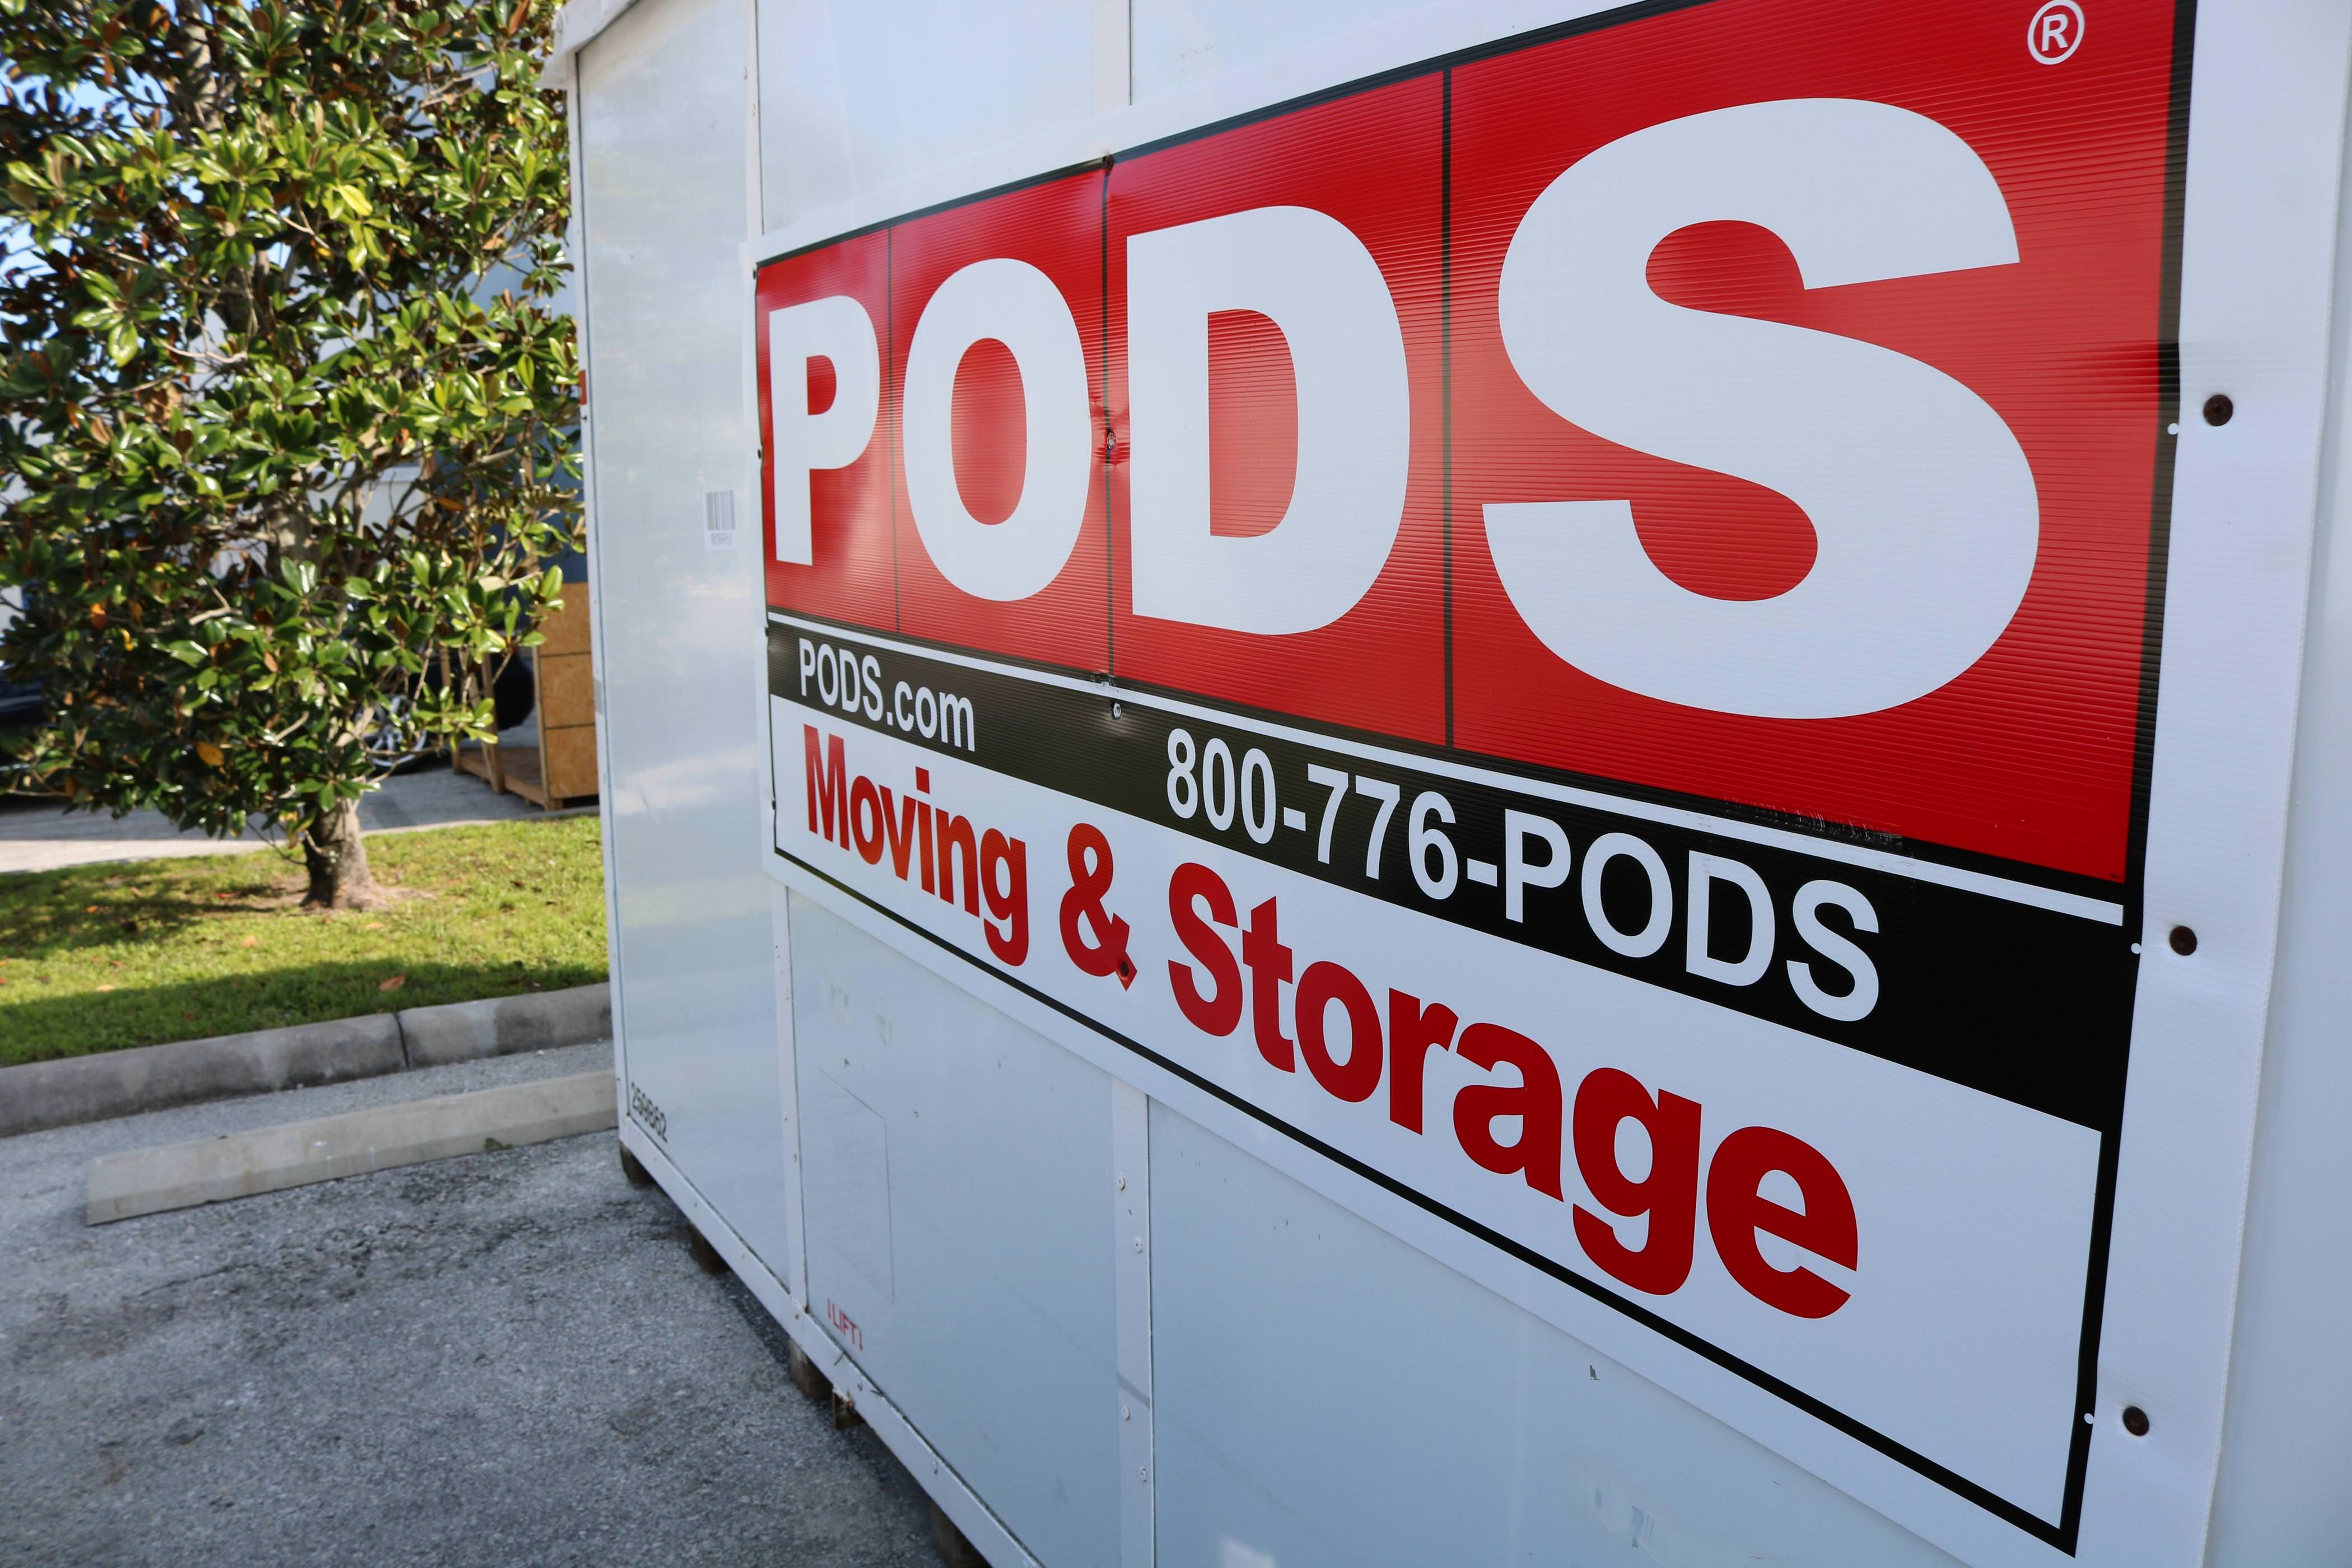 PODS - Portland, OR